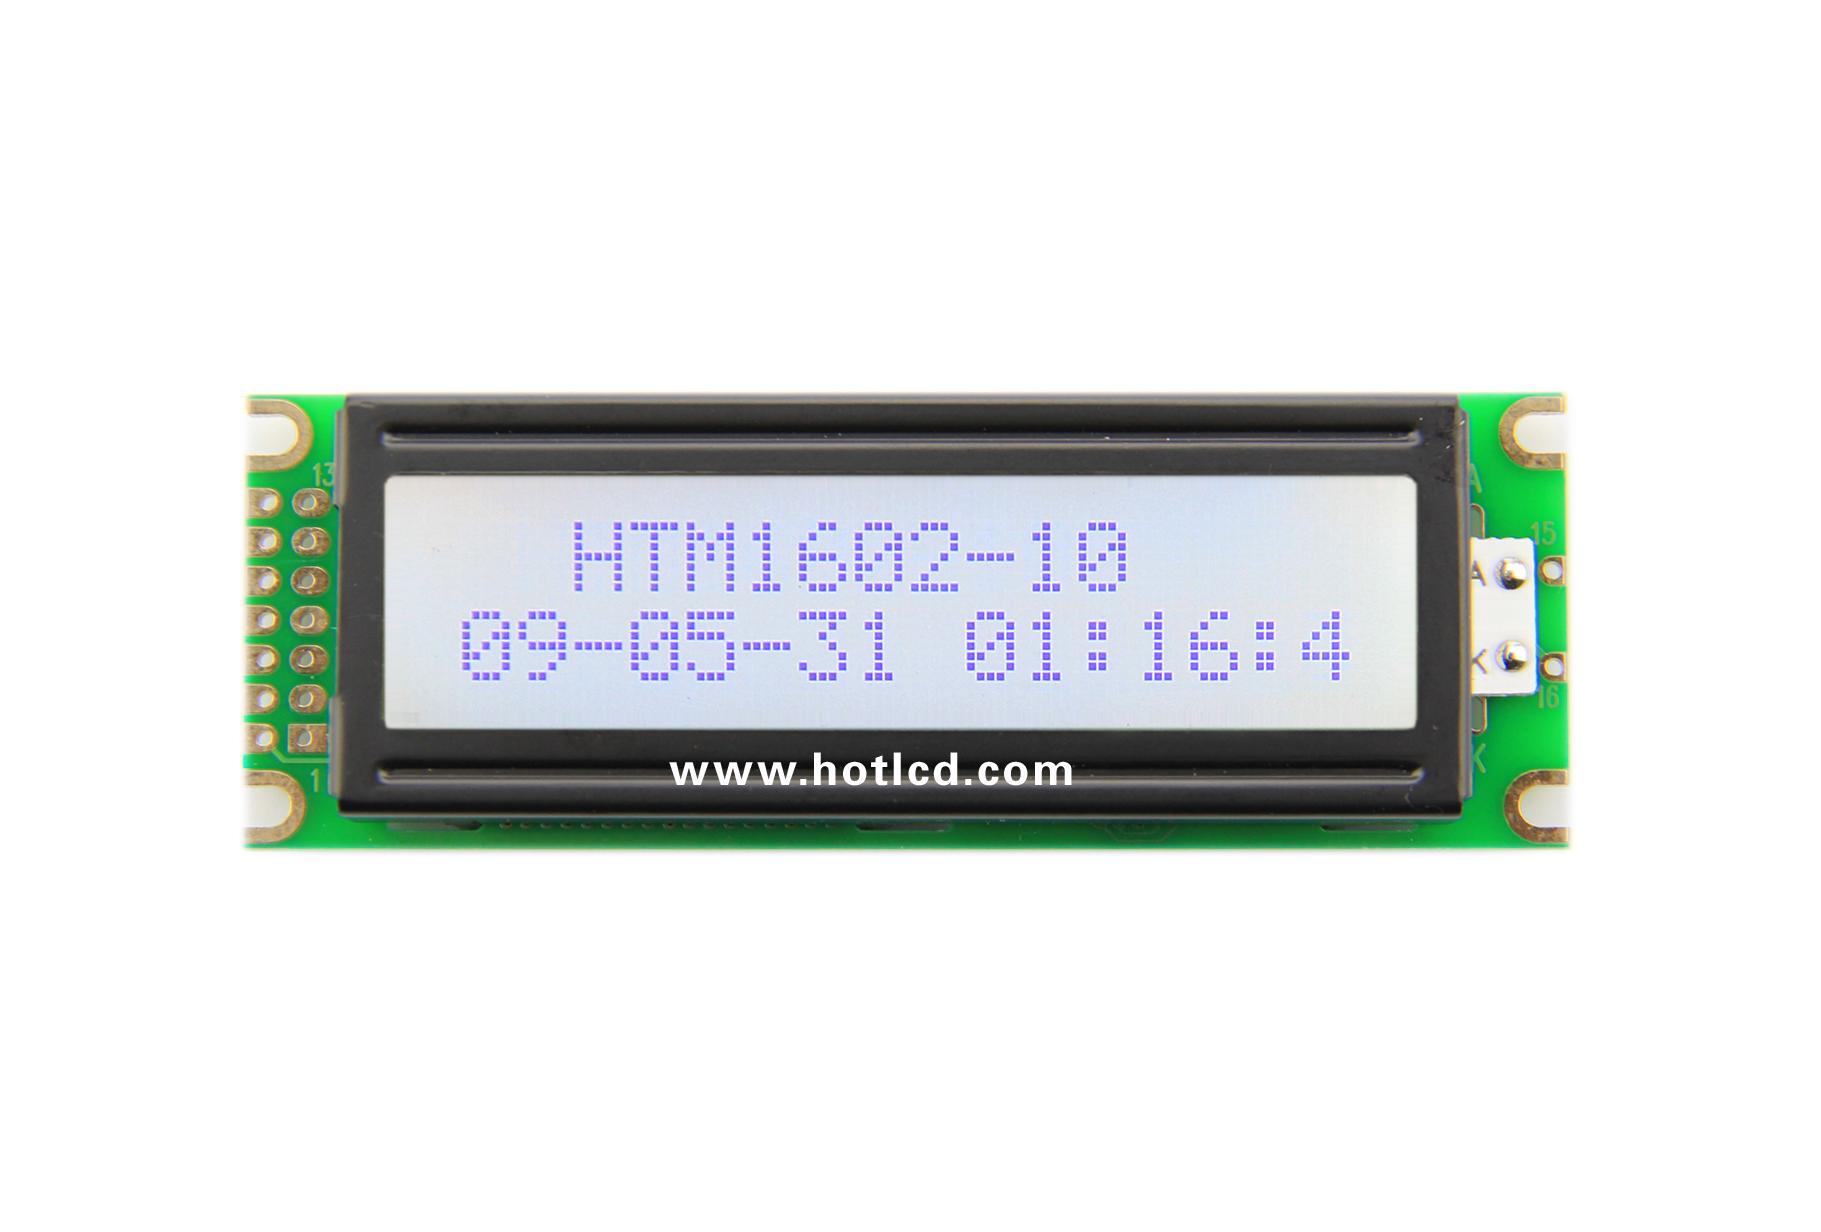 16x2--The more common 16x2 character dot matrix module(HTM1602-10)